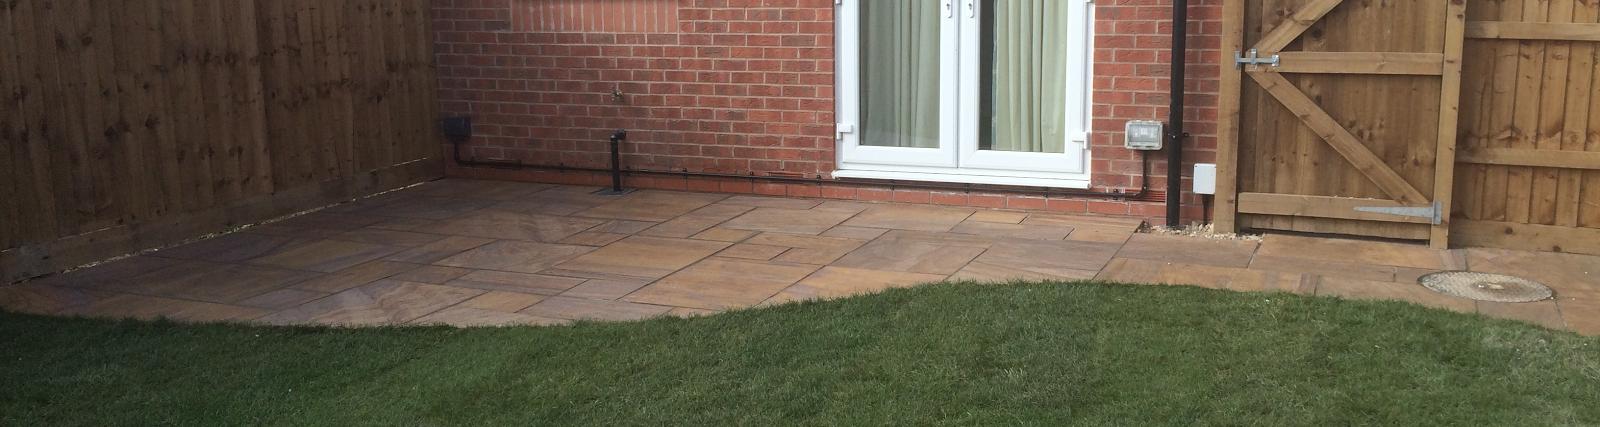 Fence Installer in Derby